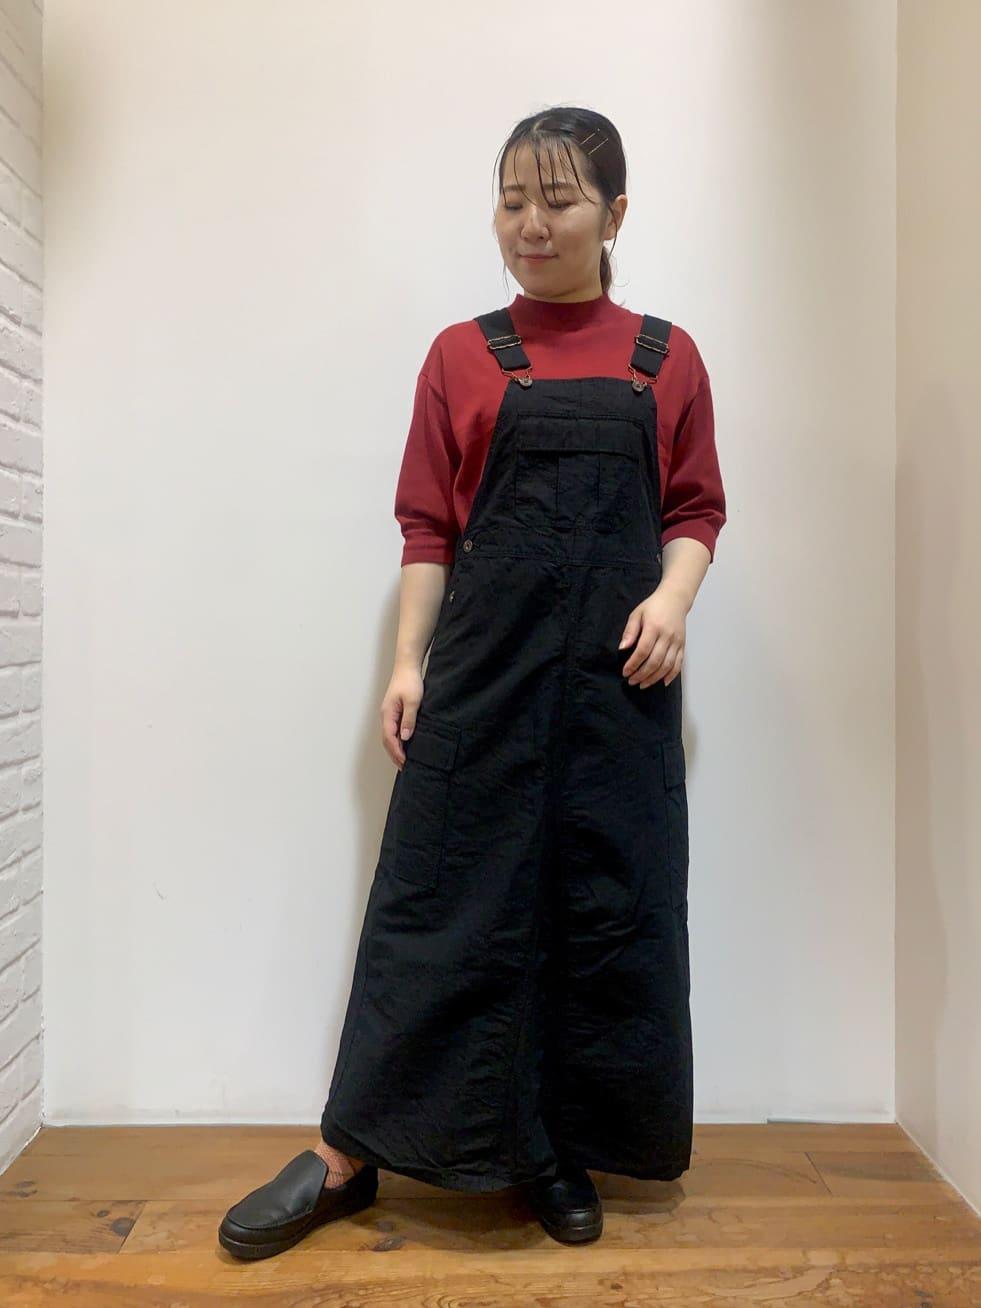 OUTLET chambre de charme 三井アウトレットパーク 多摩南大沢 身長:155cm 2021.09.03